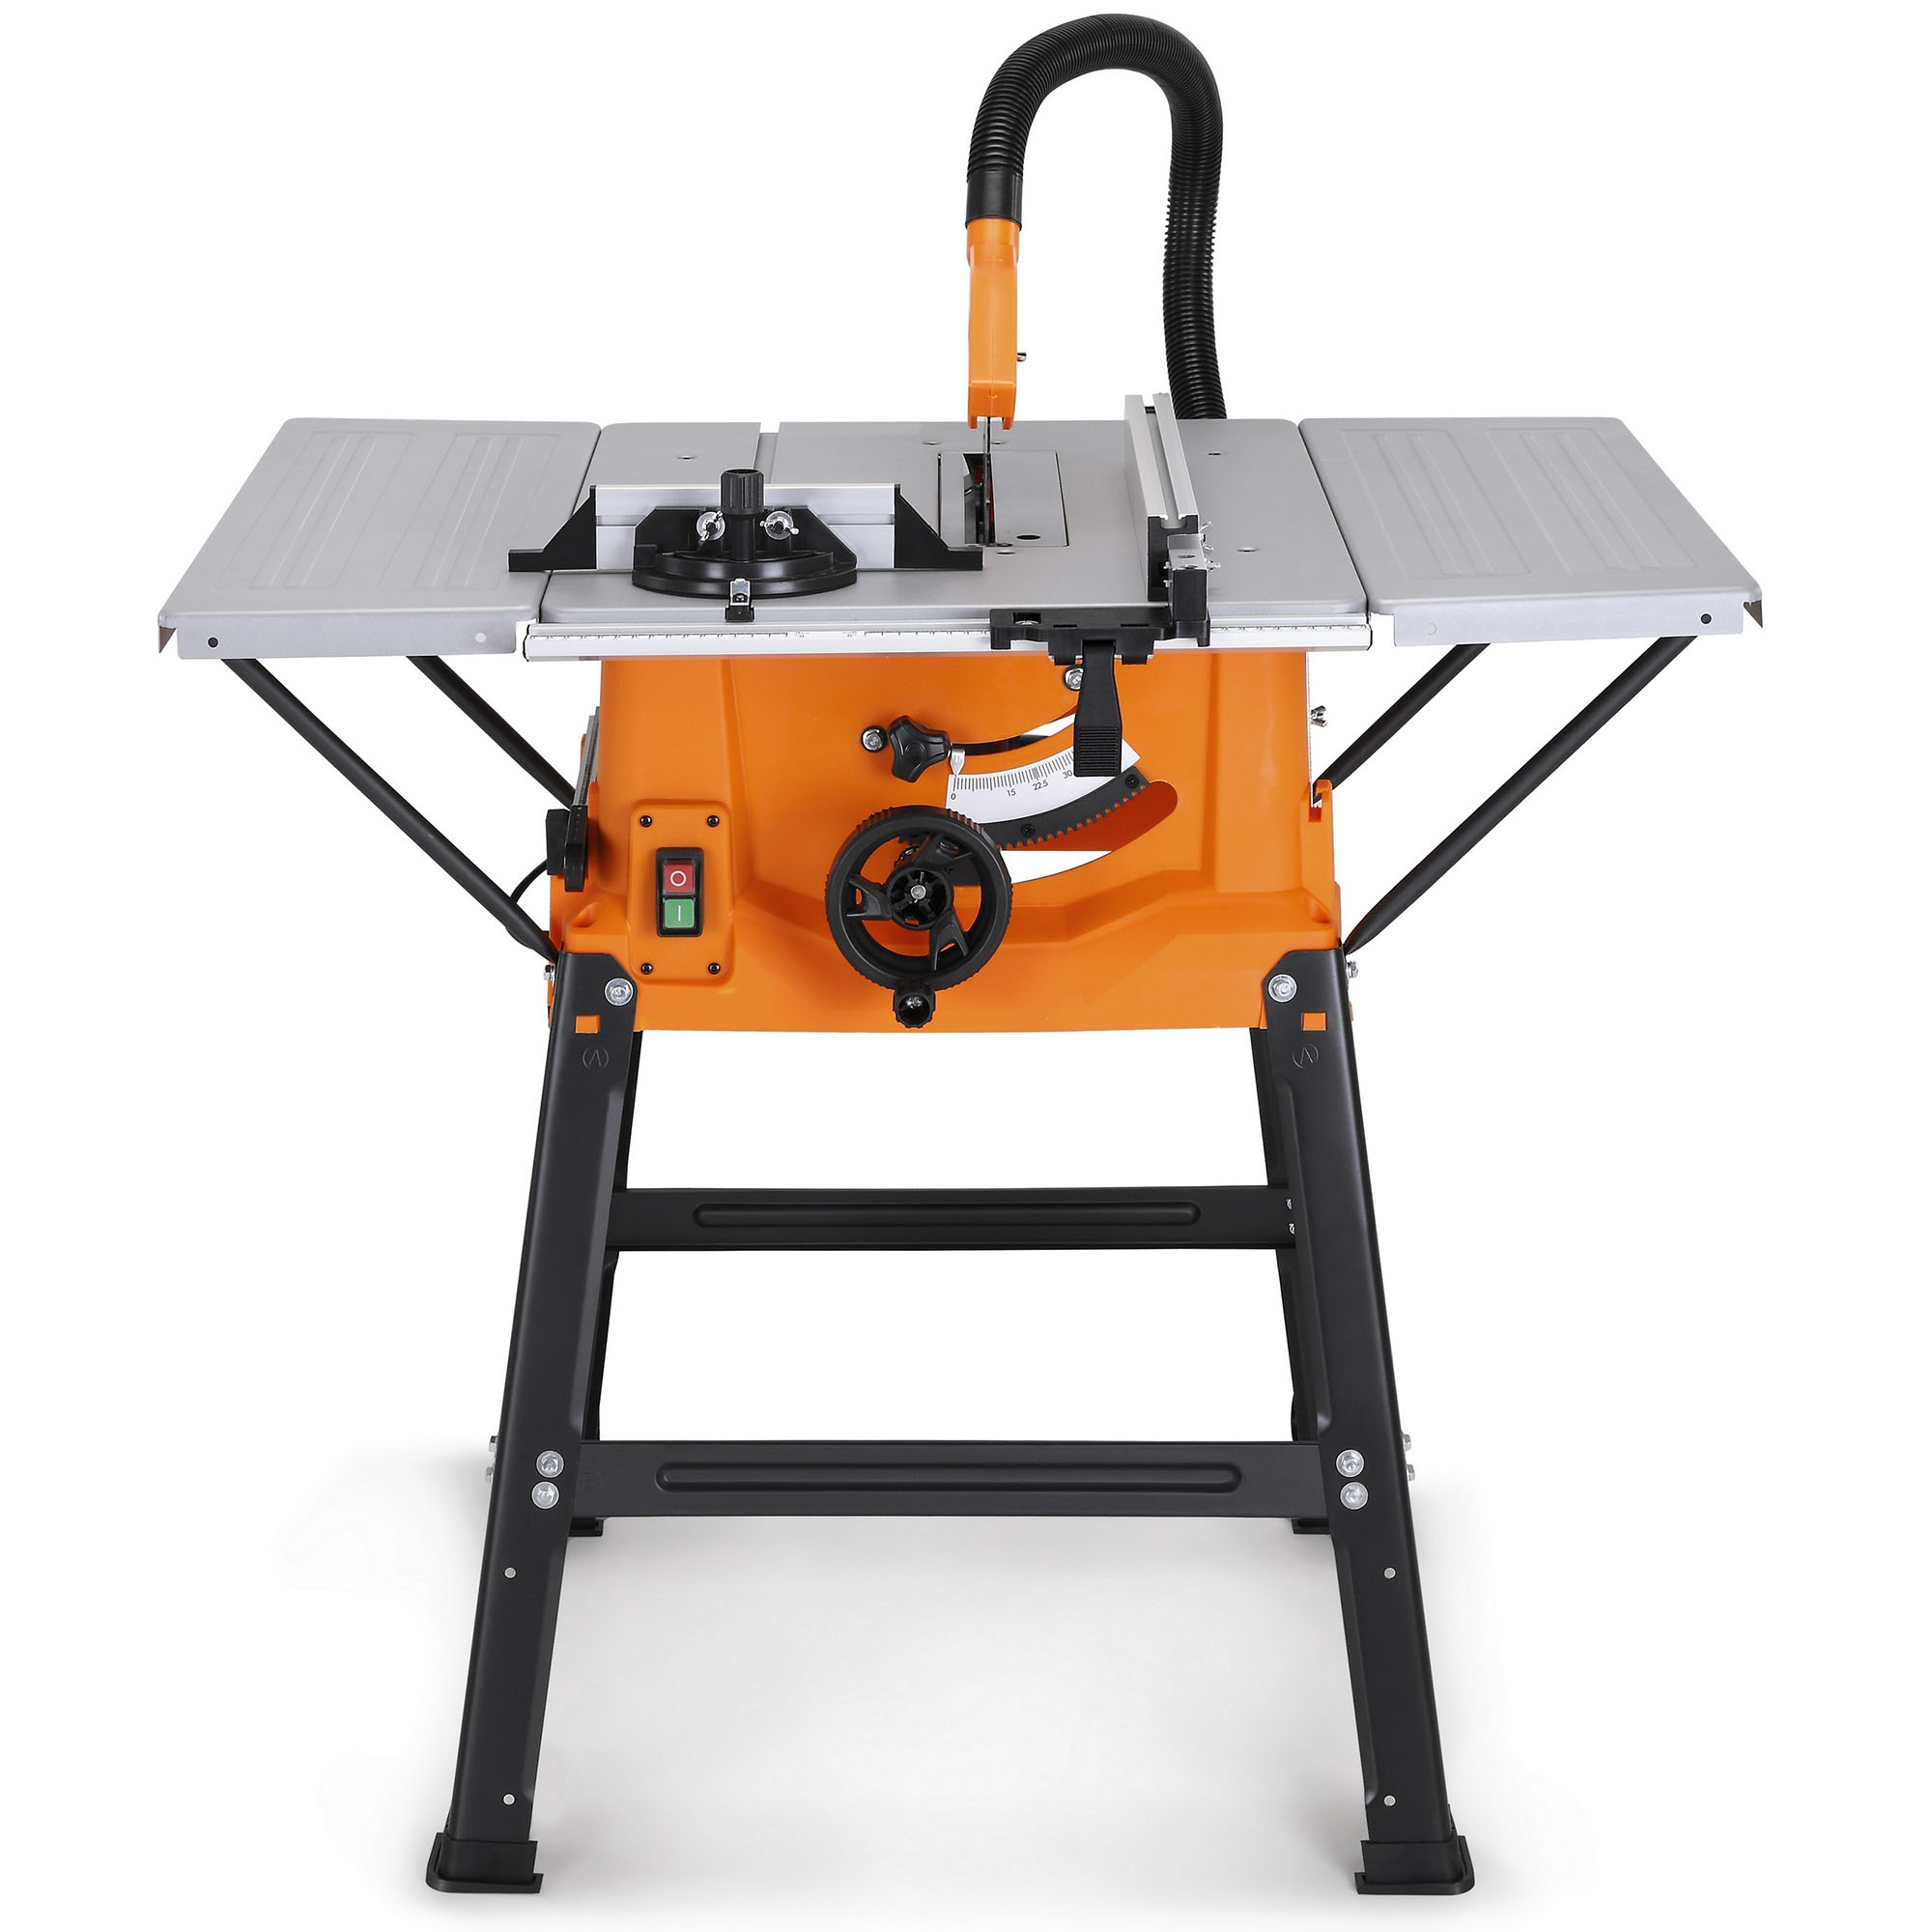 Vonhaus 1800w 10 250mm Table Saw 5500rpm 220v Precision Cuts Sturdy Underframe Ebay